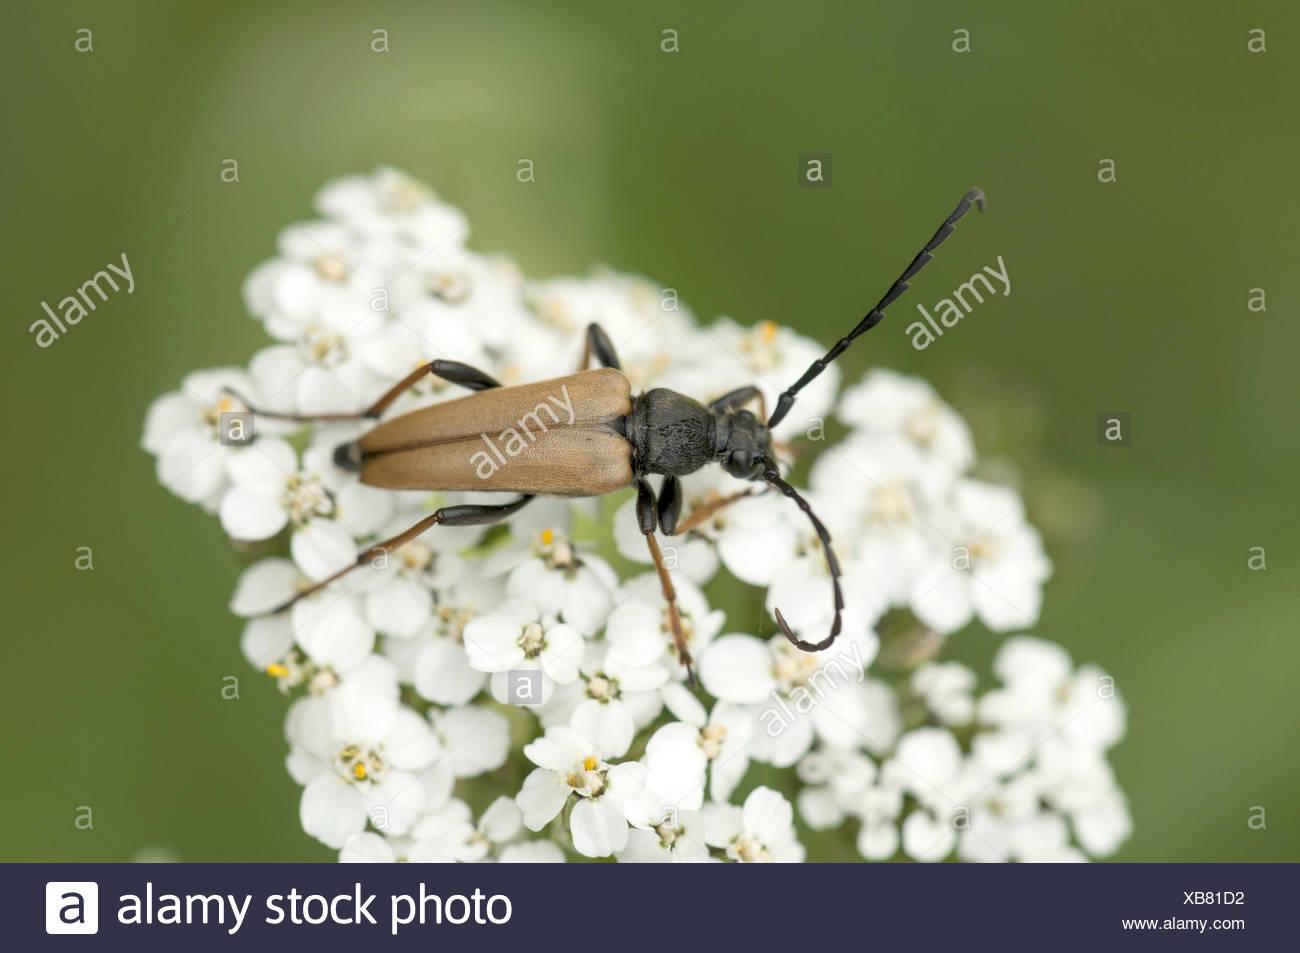 Longhorn Beetle (Stictoleptura rubra) - Stock Image